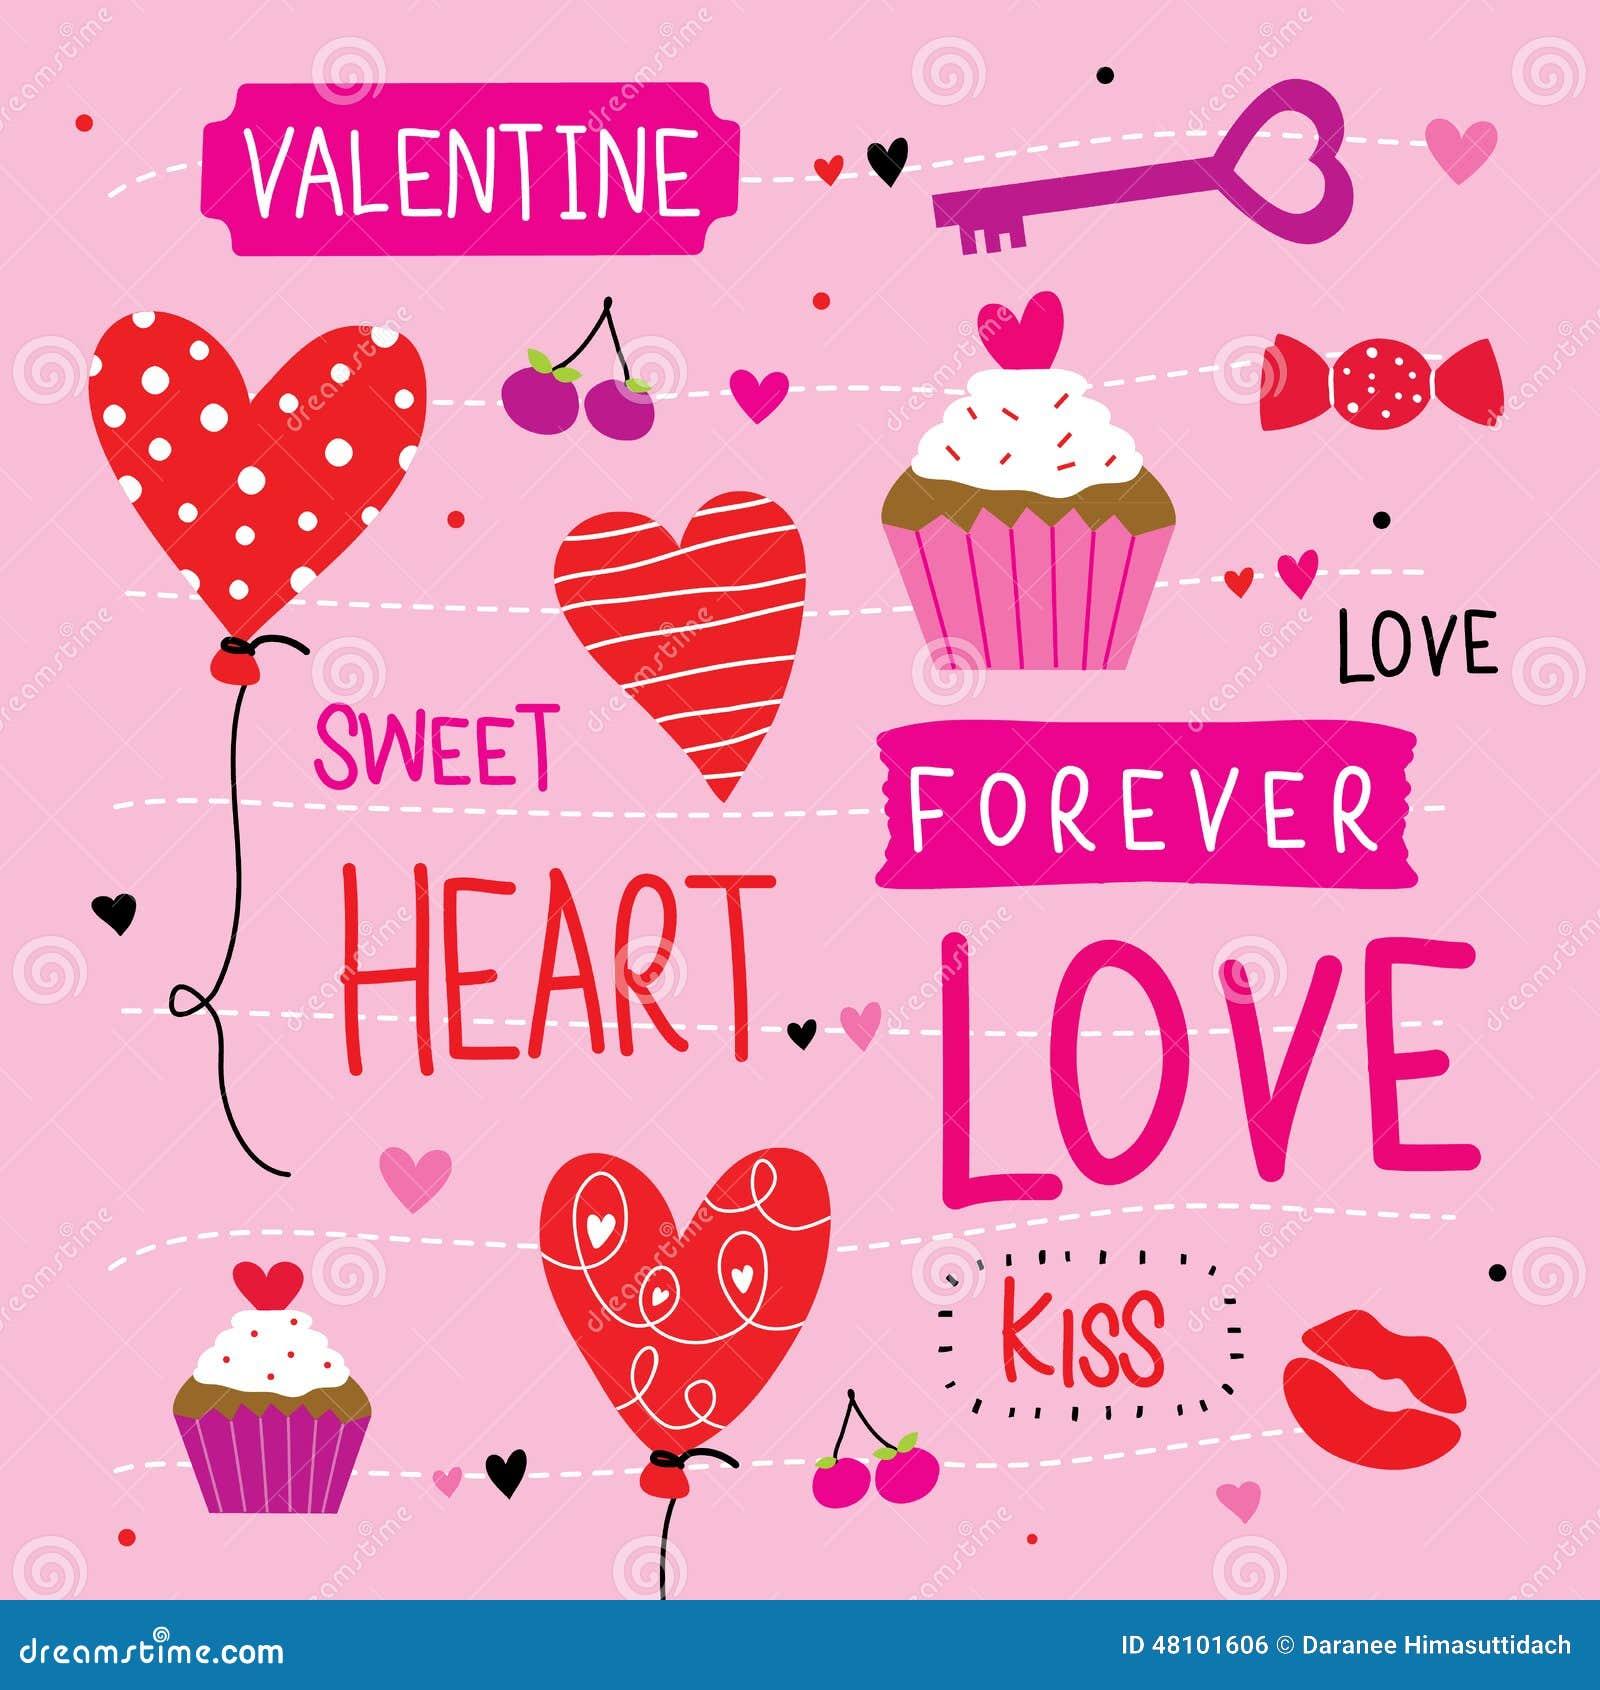 Valentine I Love You Sweetheart Cute Cartoon Vector Stock Vector